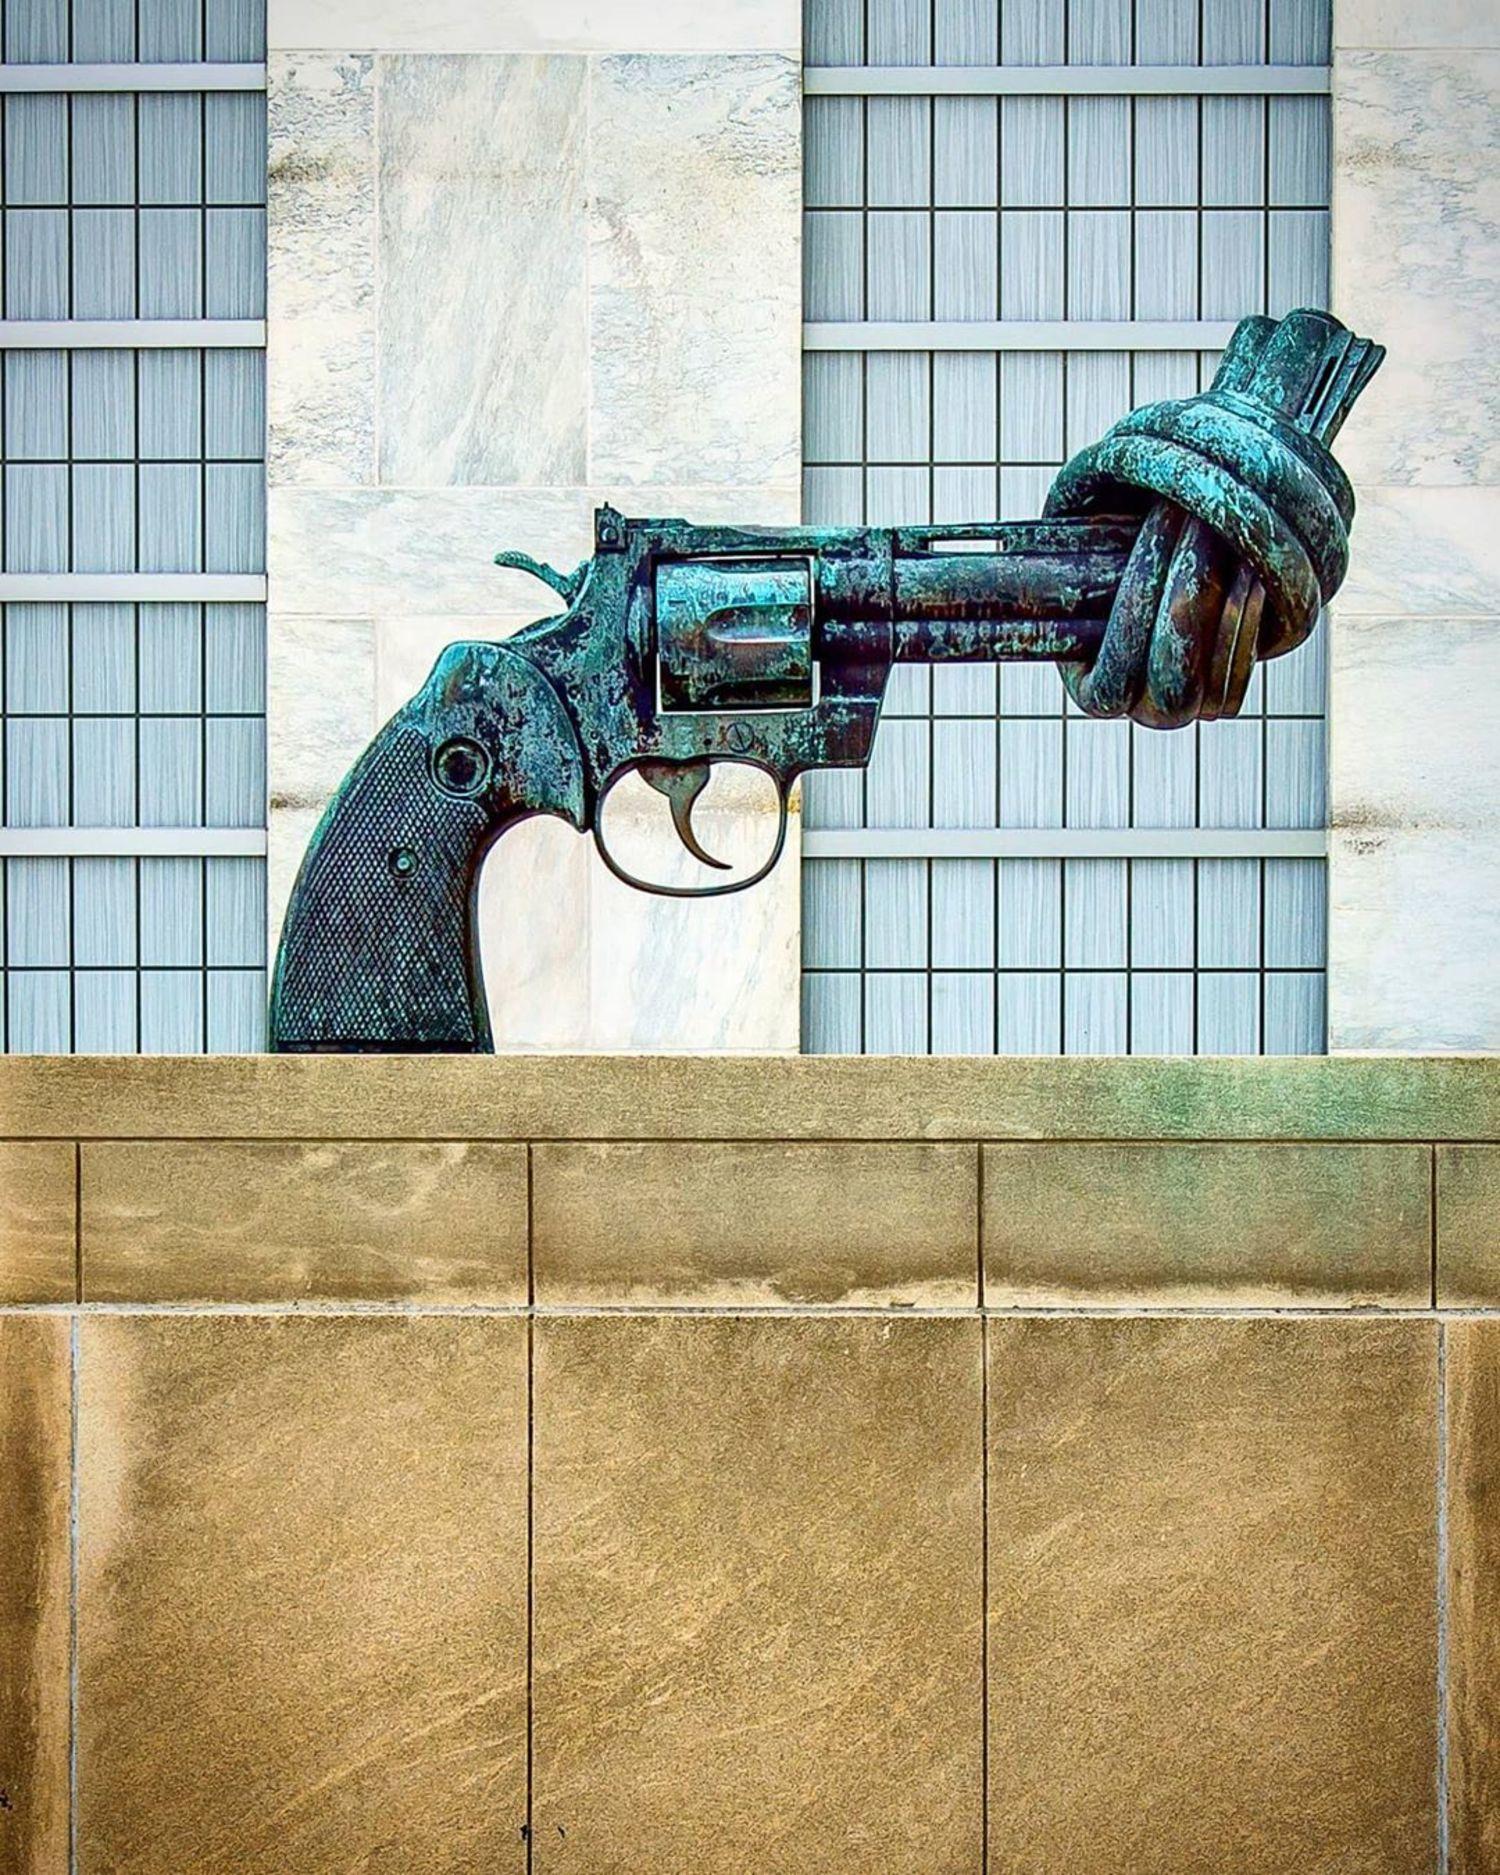 """The Knotted Gun"", Carl Fredrick Reuterswärd, United Nations Headquarters, Manhattan"